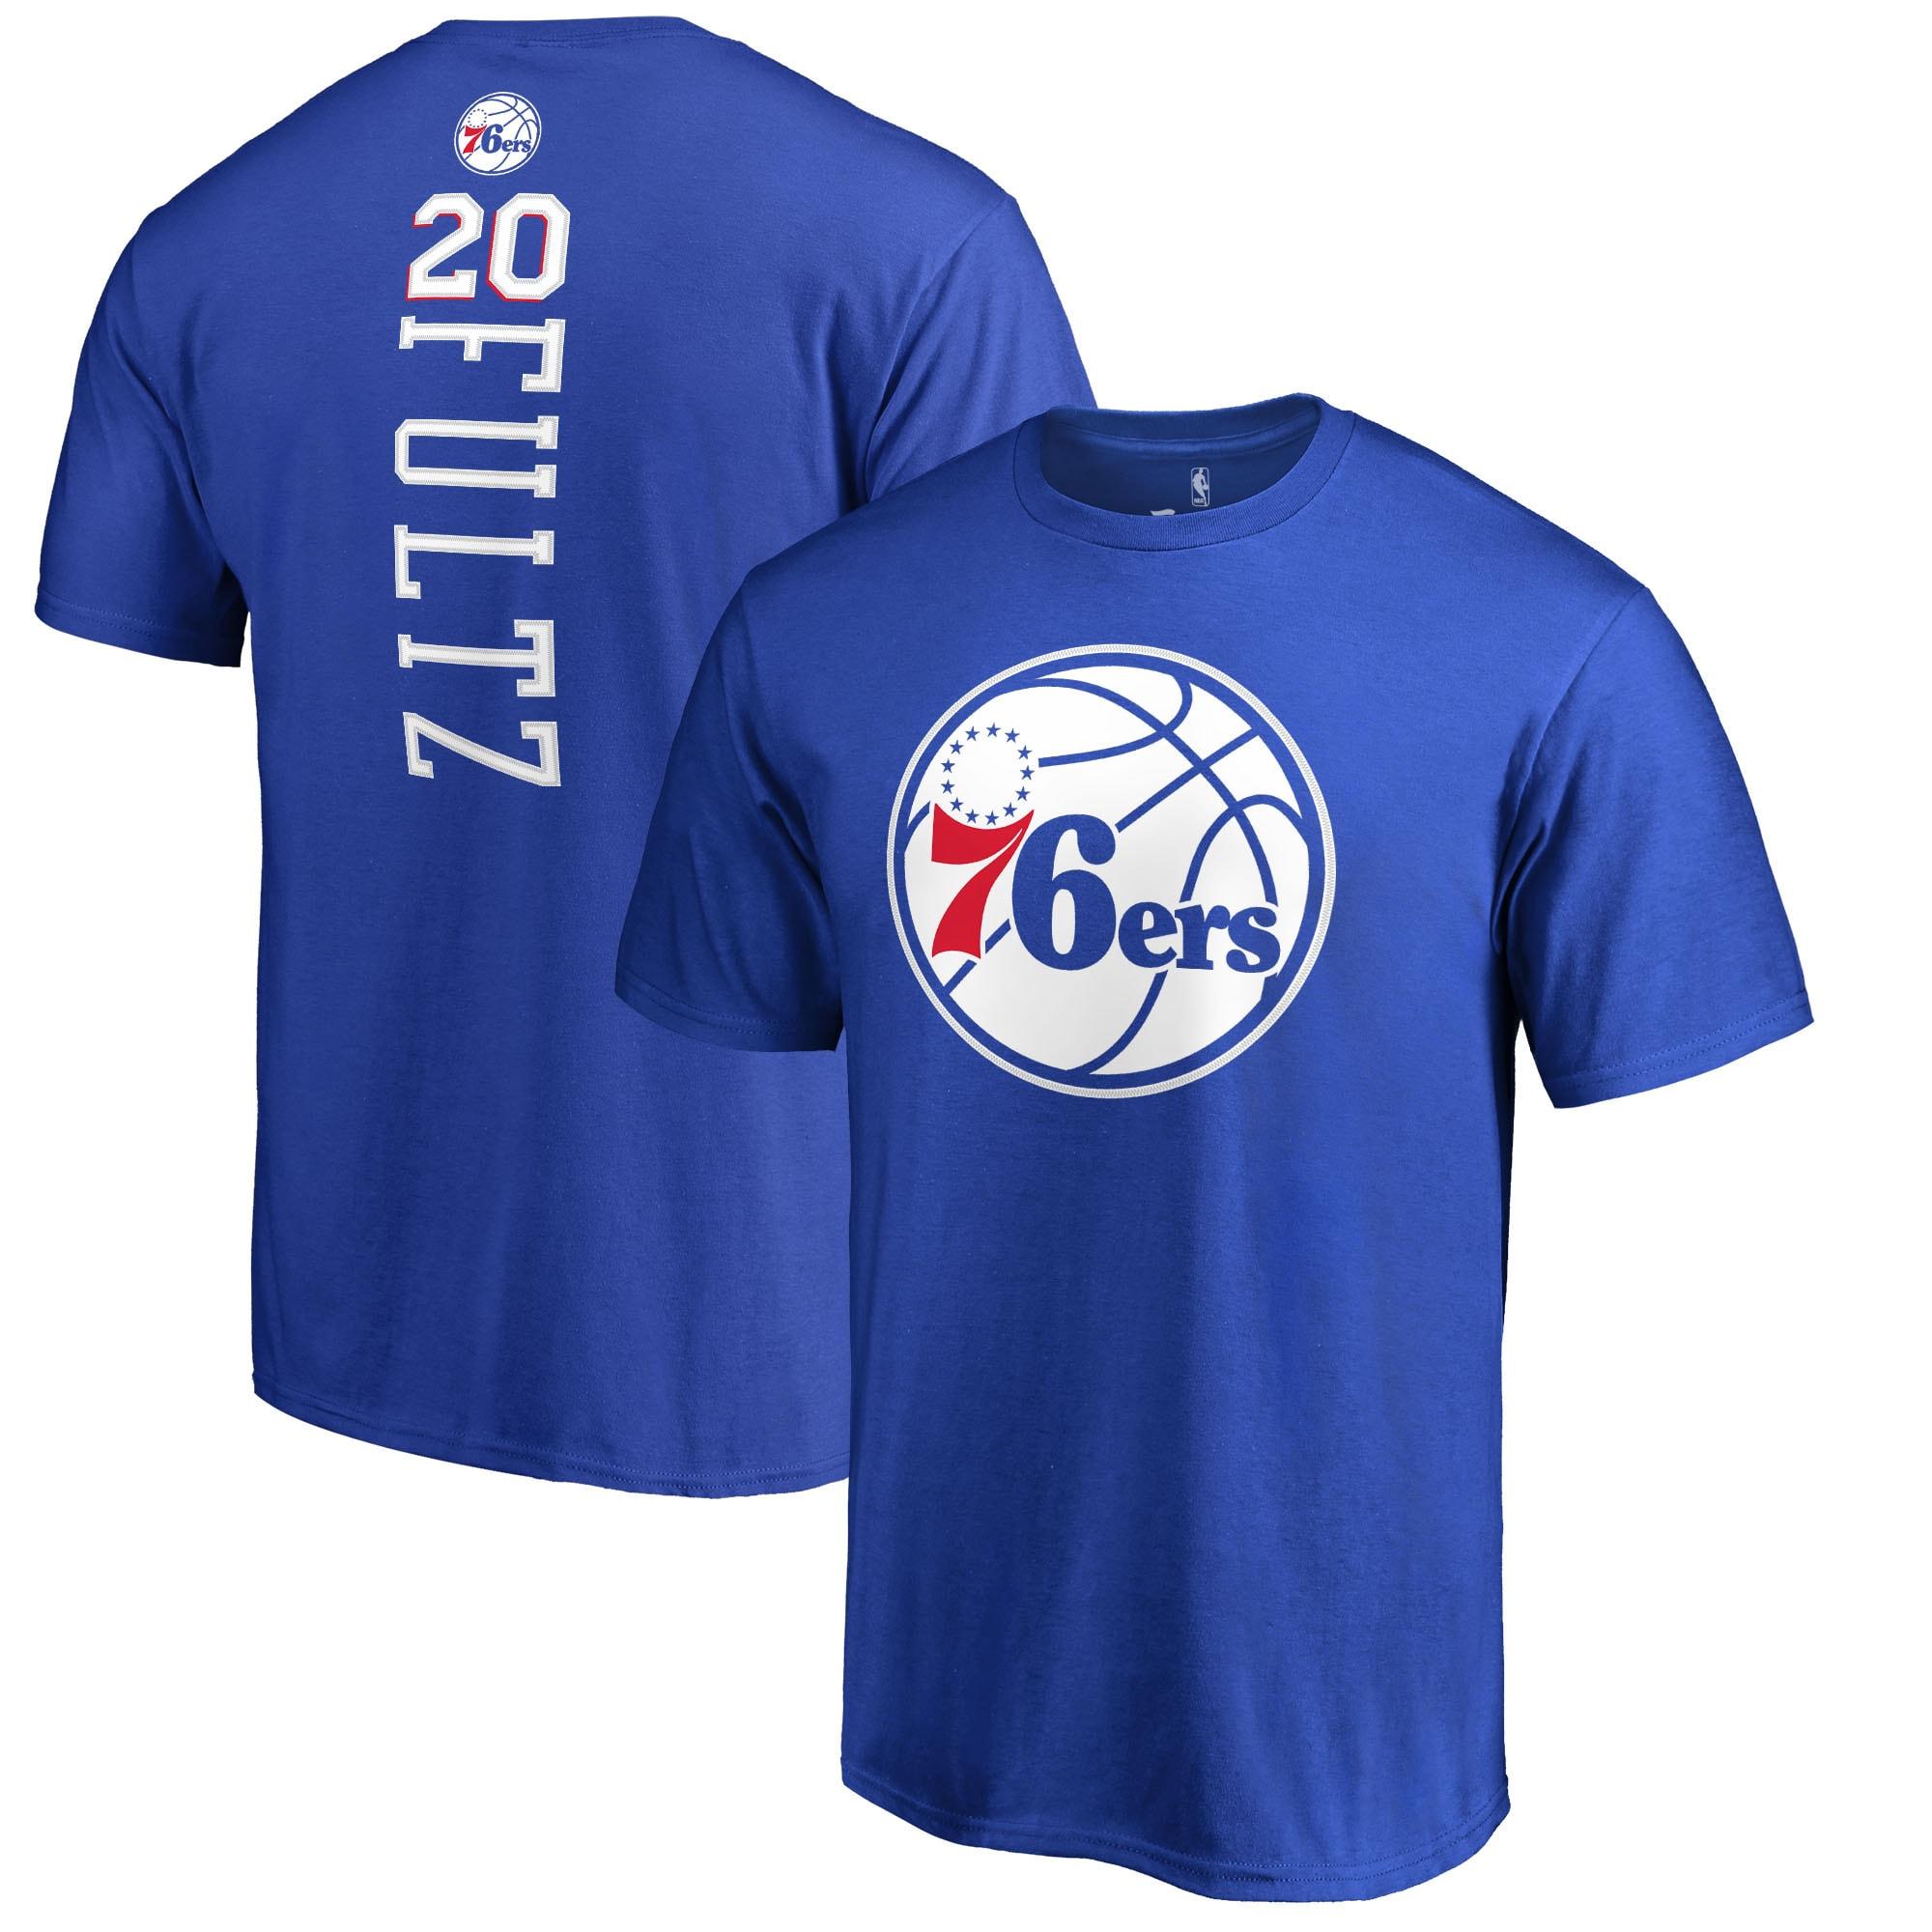 Markelle Fultz Philadelphia 76ers Fanatics Branded Backer Big & Tall T-Shirt - Royal